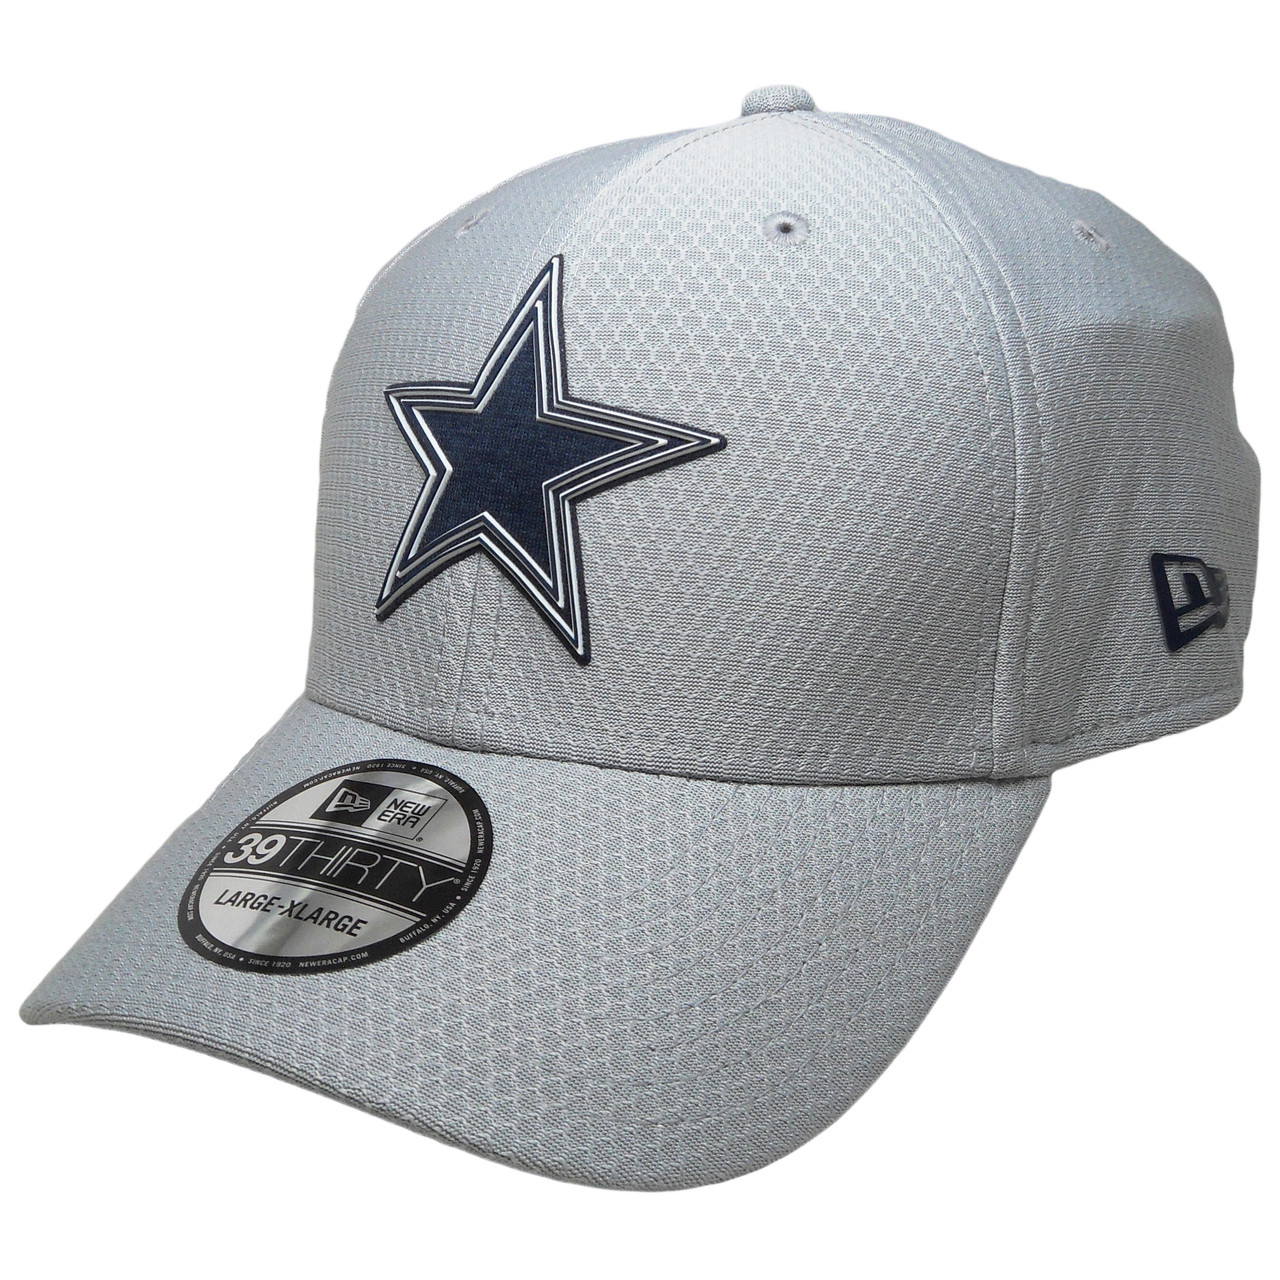 promo code 99675 26f79 Dallas Cowboys New Era official 2018 Training 3930 Flexfit Hat - Gray, Navy,  White - ECapsUnlimited.com